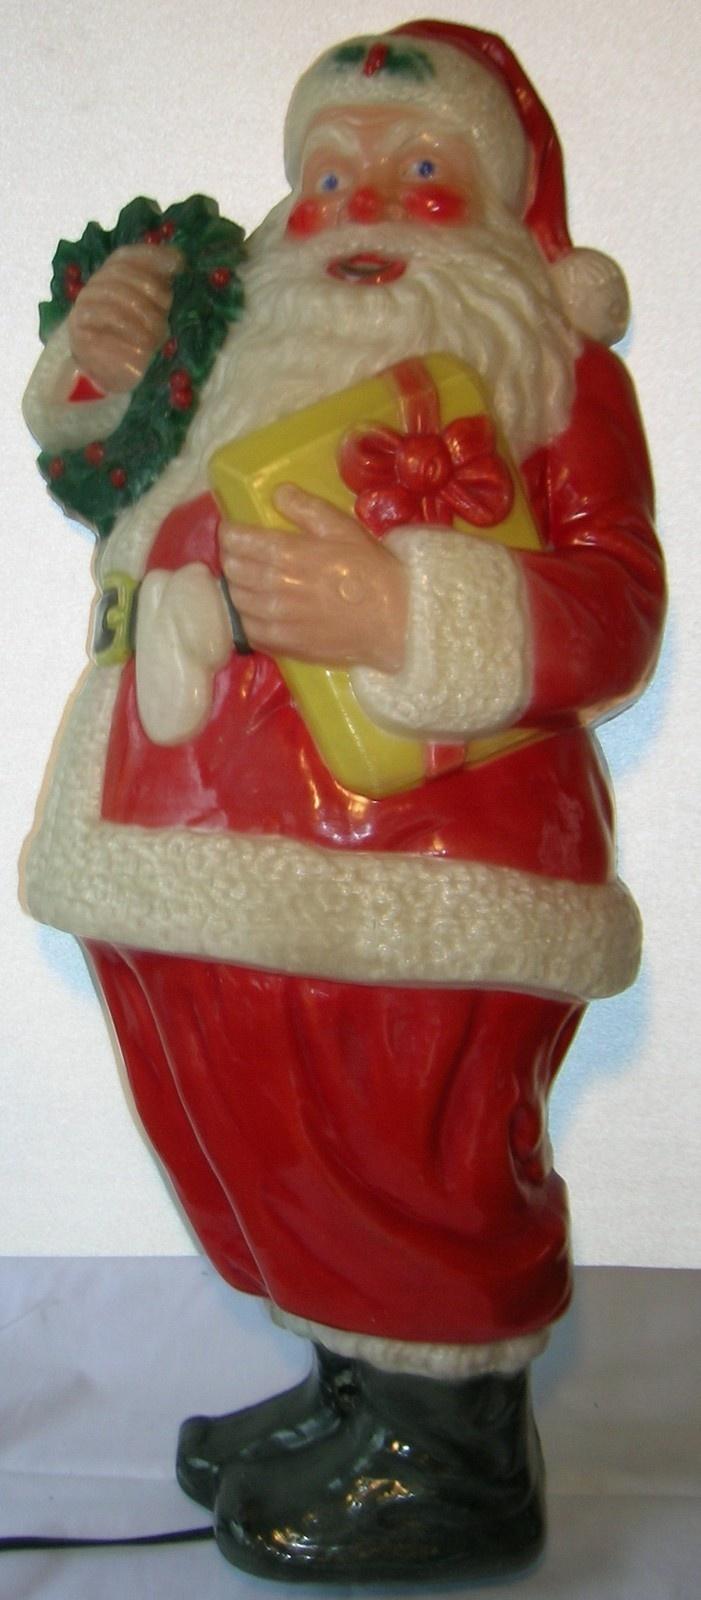 Vintage 1950's Noma Christmas Santa Claus Blow Mold Light Reverse Paint |